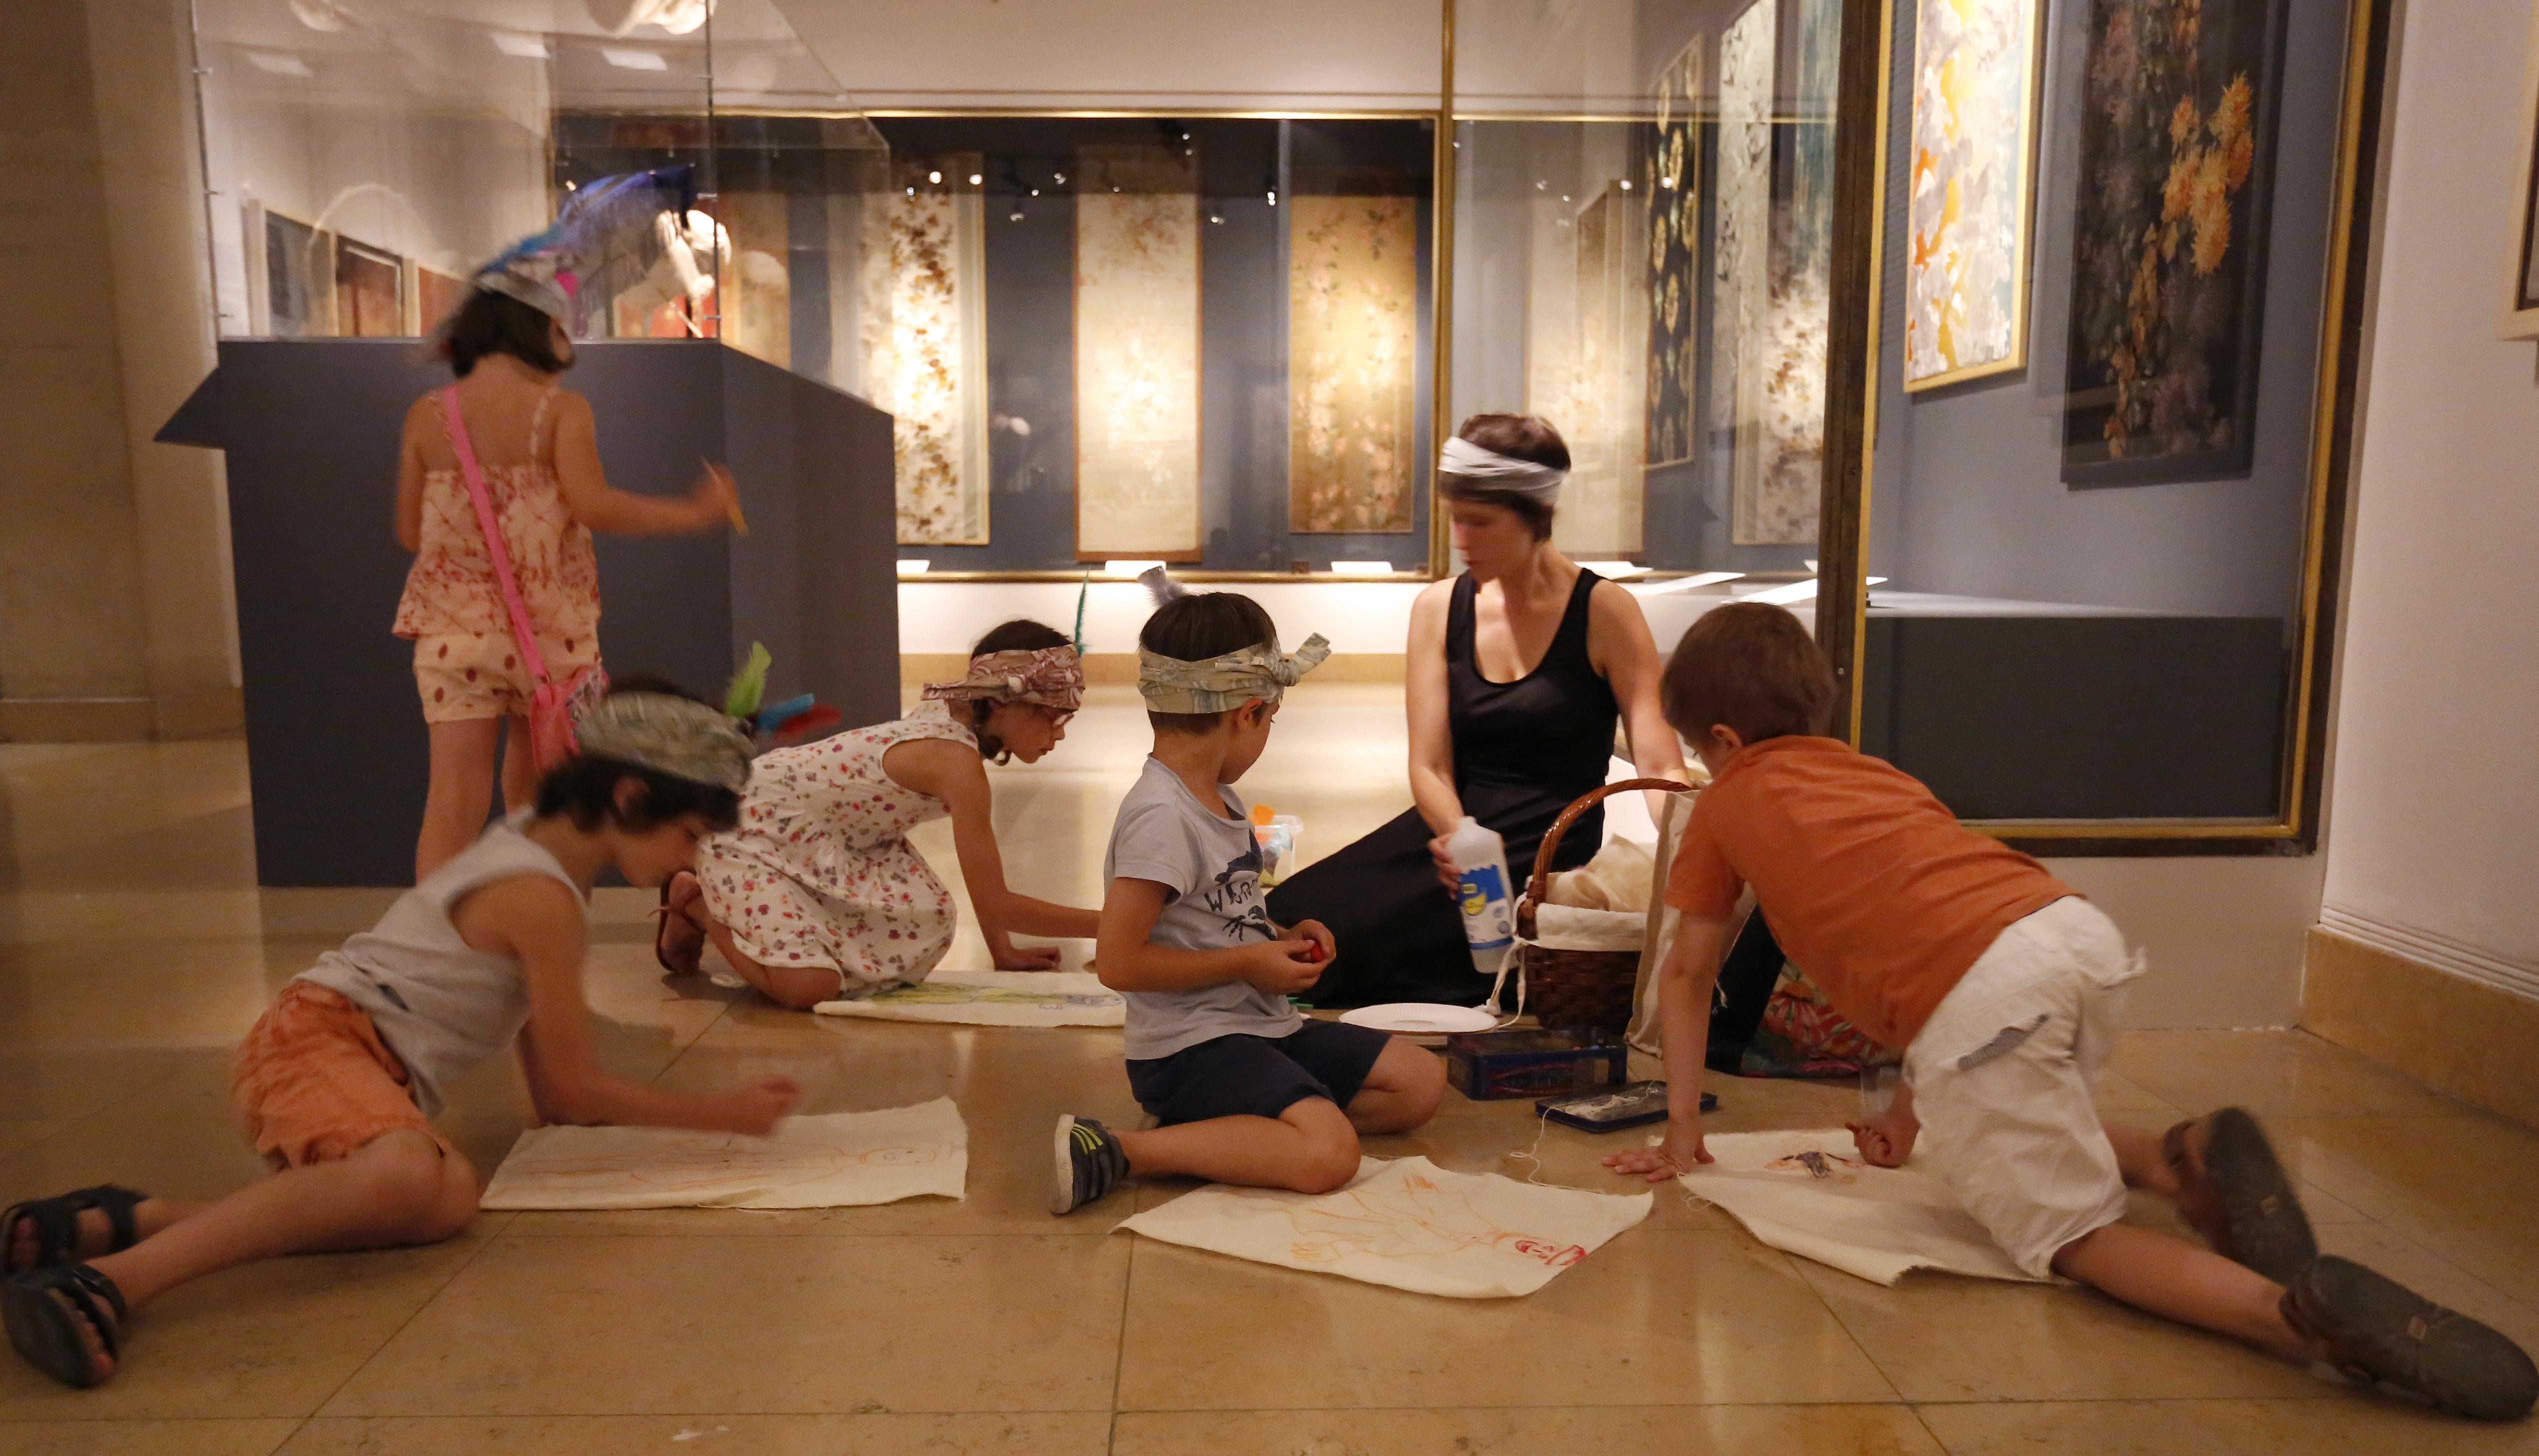 Musée du tissu Lyon - Sylvain PRETTO (7)